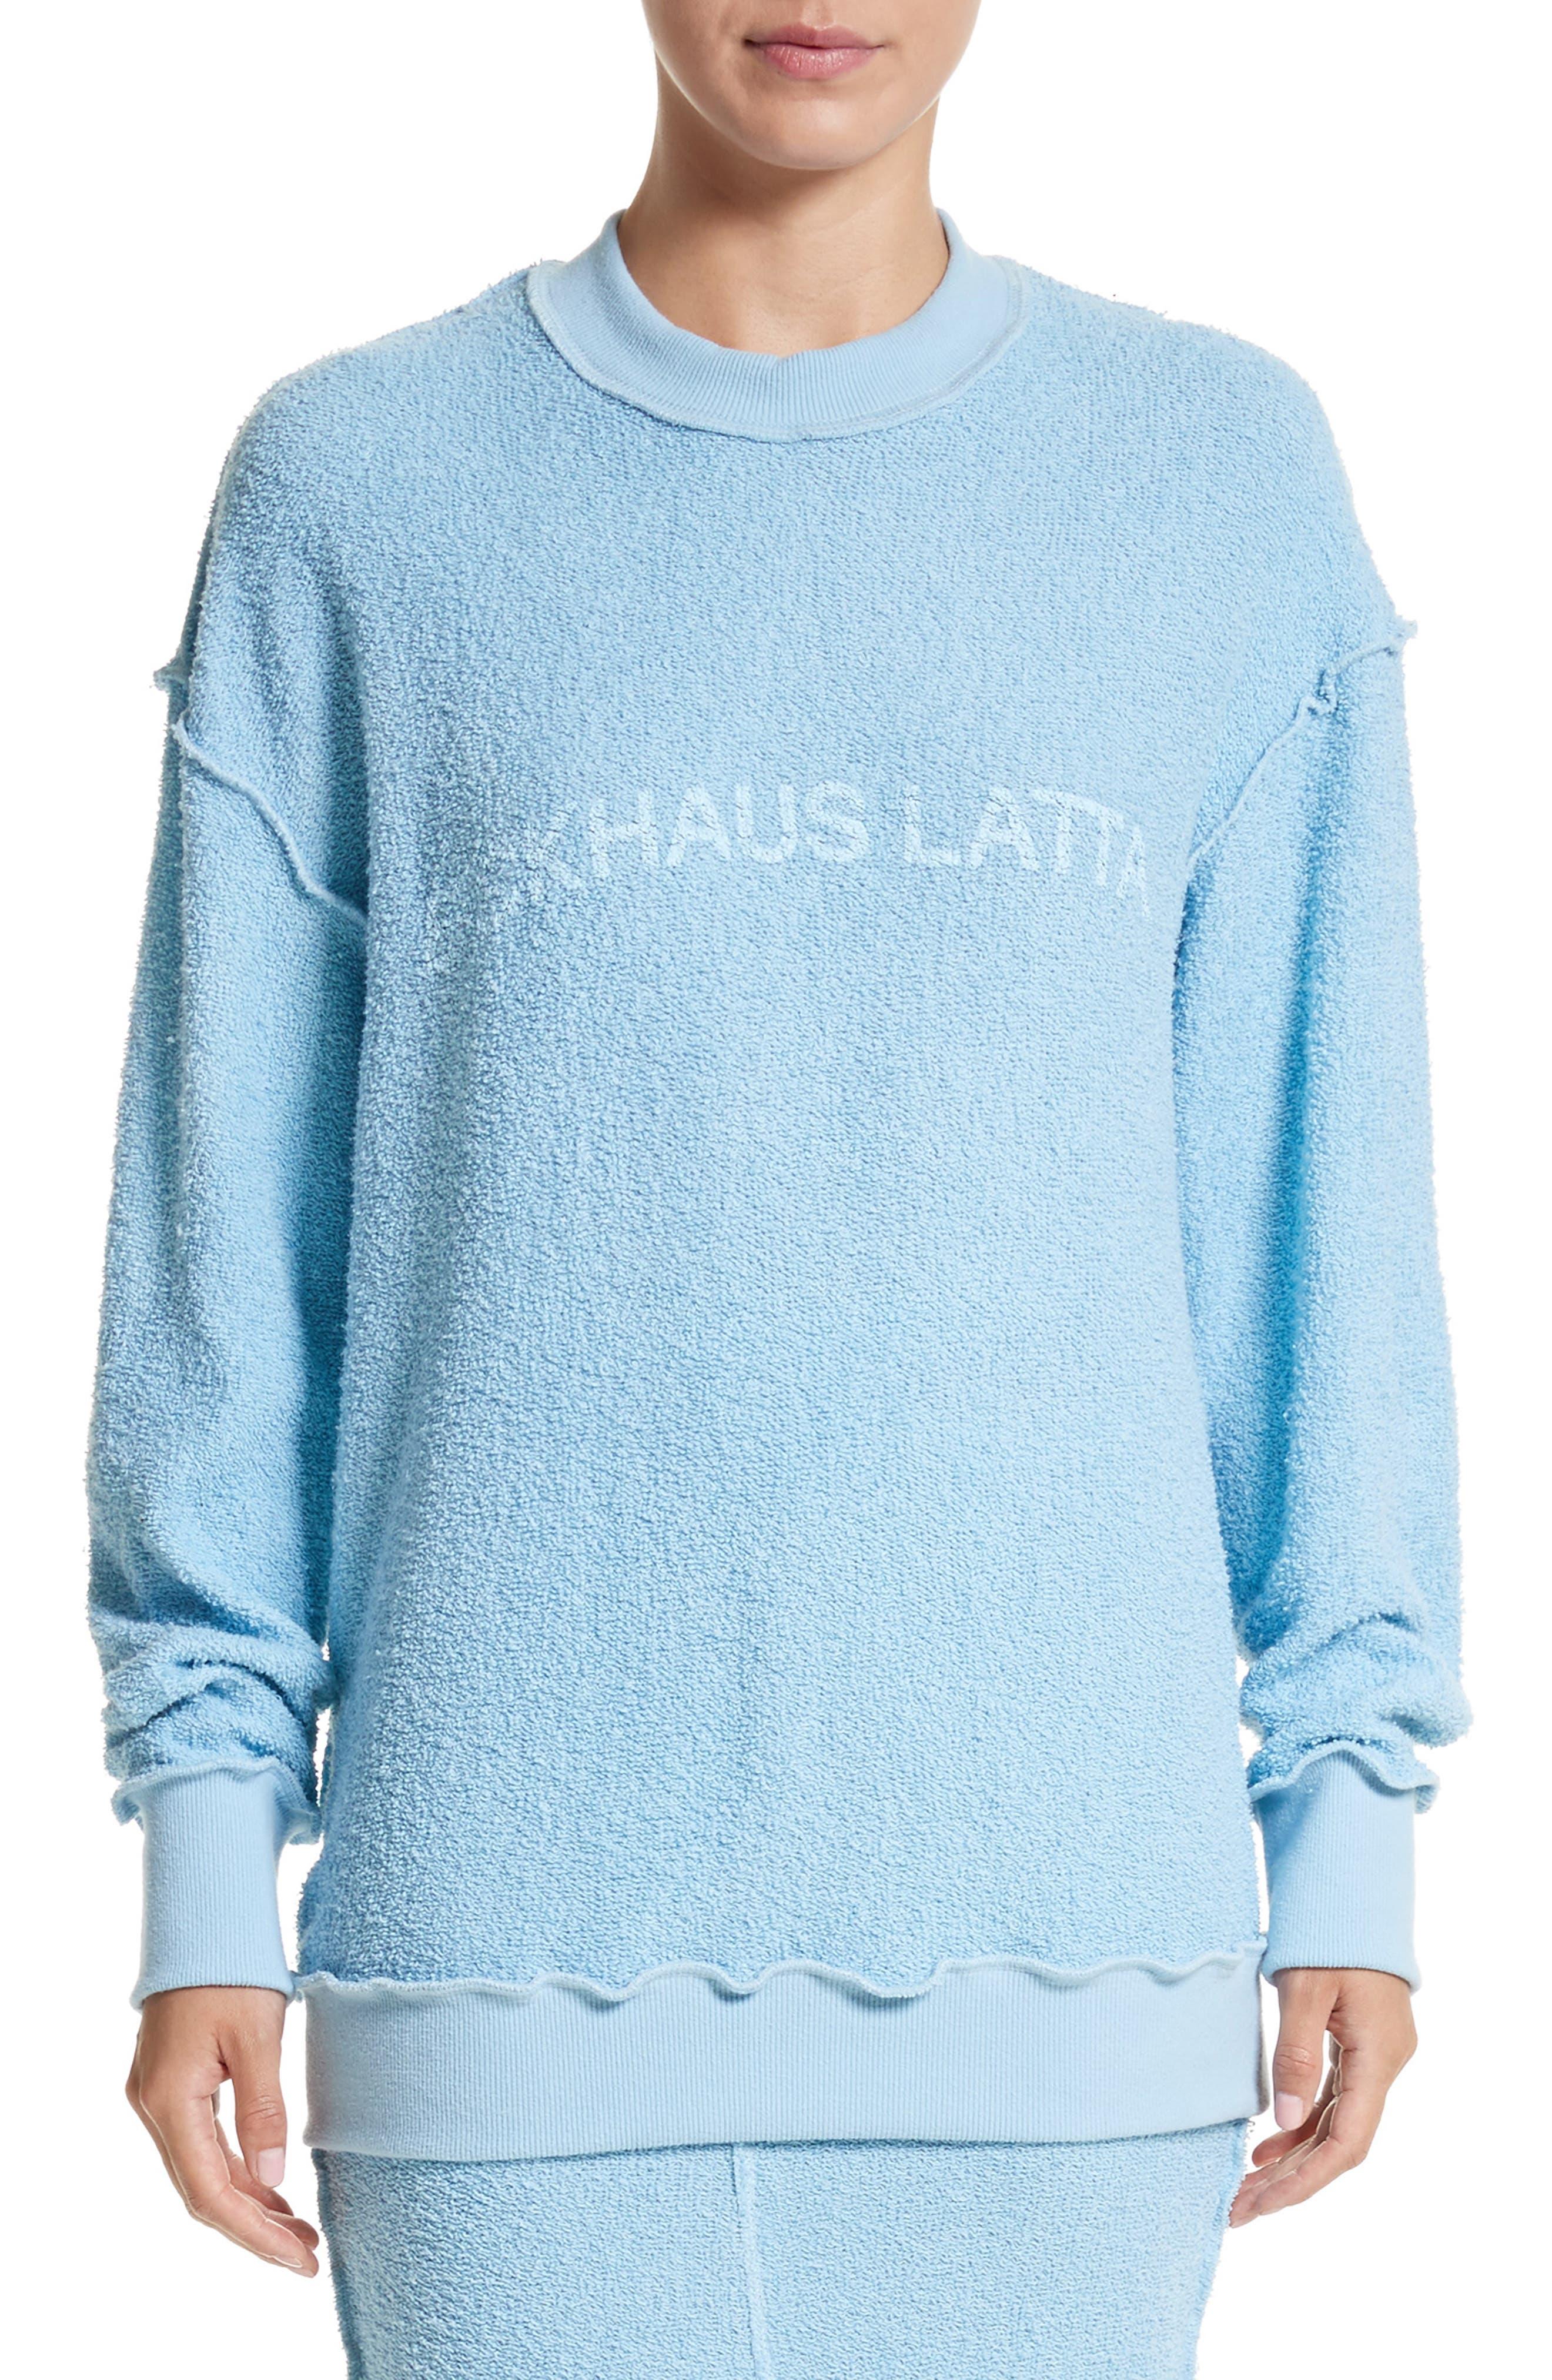 Main Image - Eckhaus Latta Drop Shoulder Reverse Terry Sweatshirt